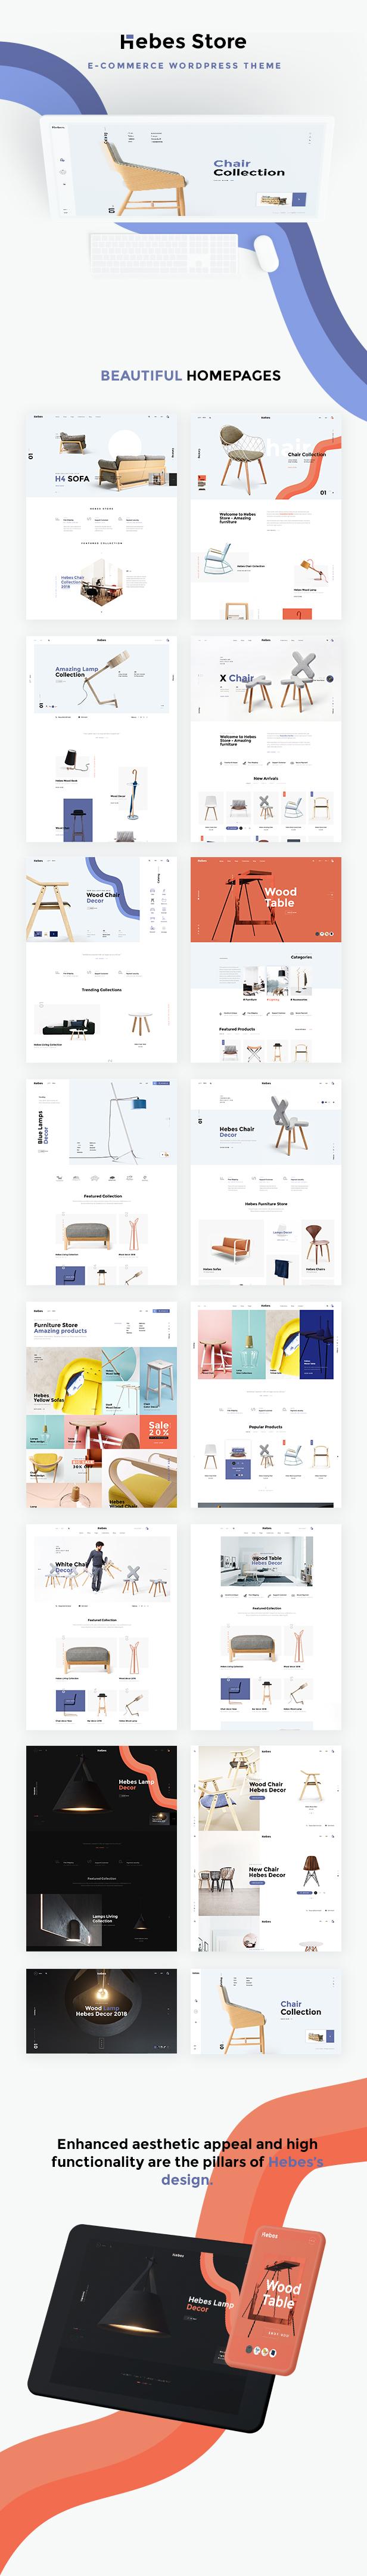 Hebes - Elegent MultiPurpose WooCommerce WordPress Theme - 9